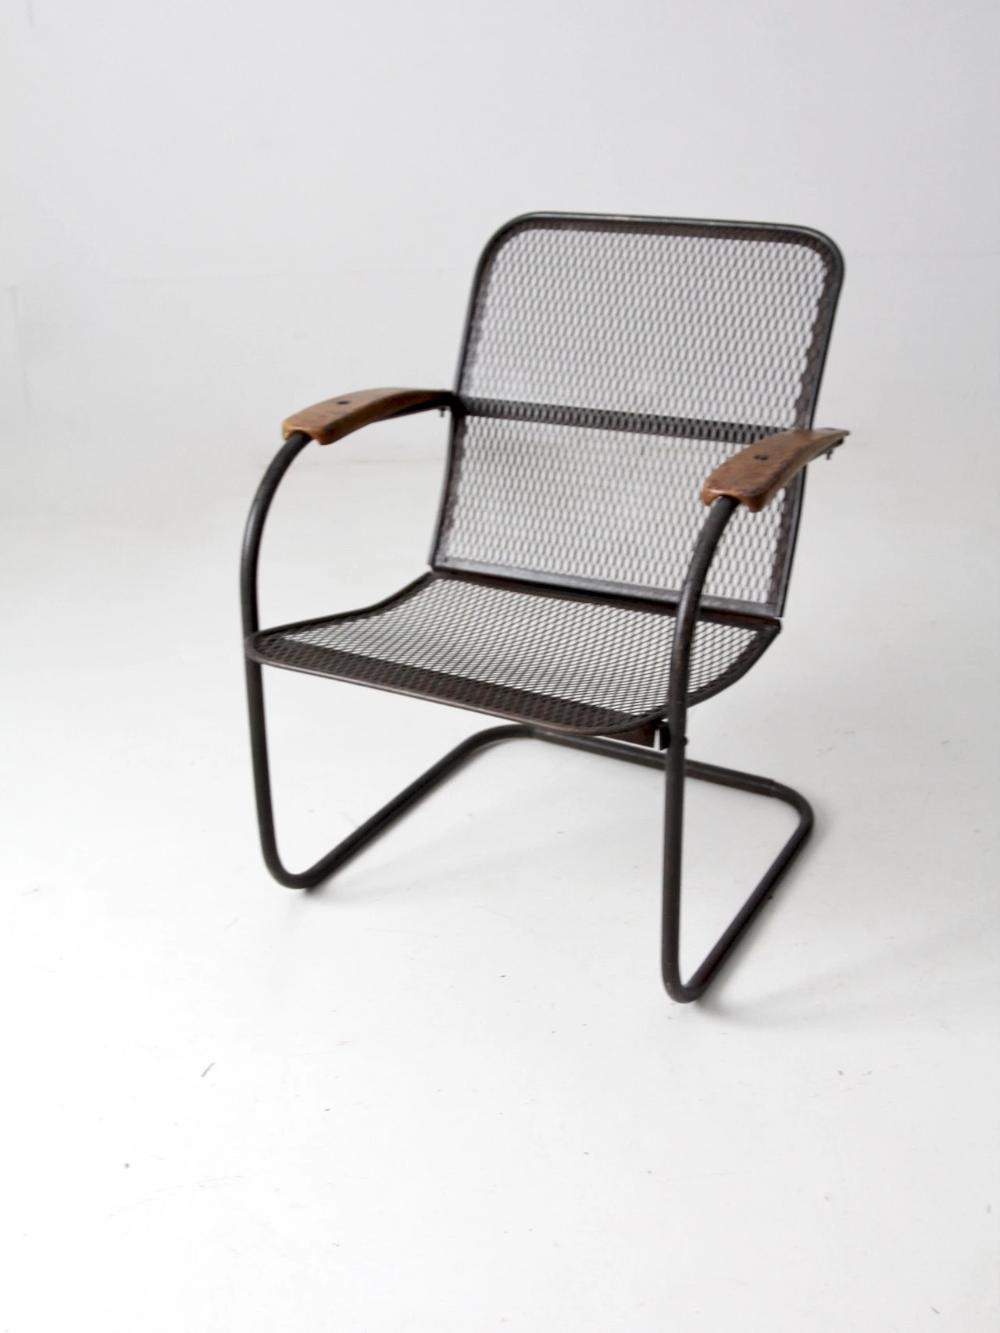 Vintage Expanded Metal Patio Furniture